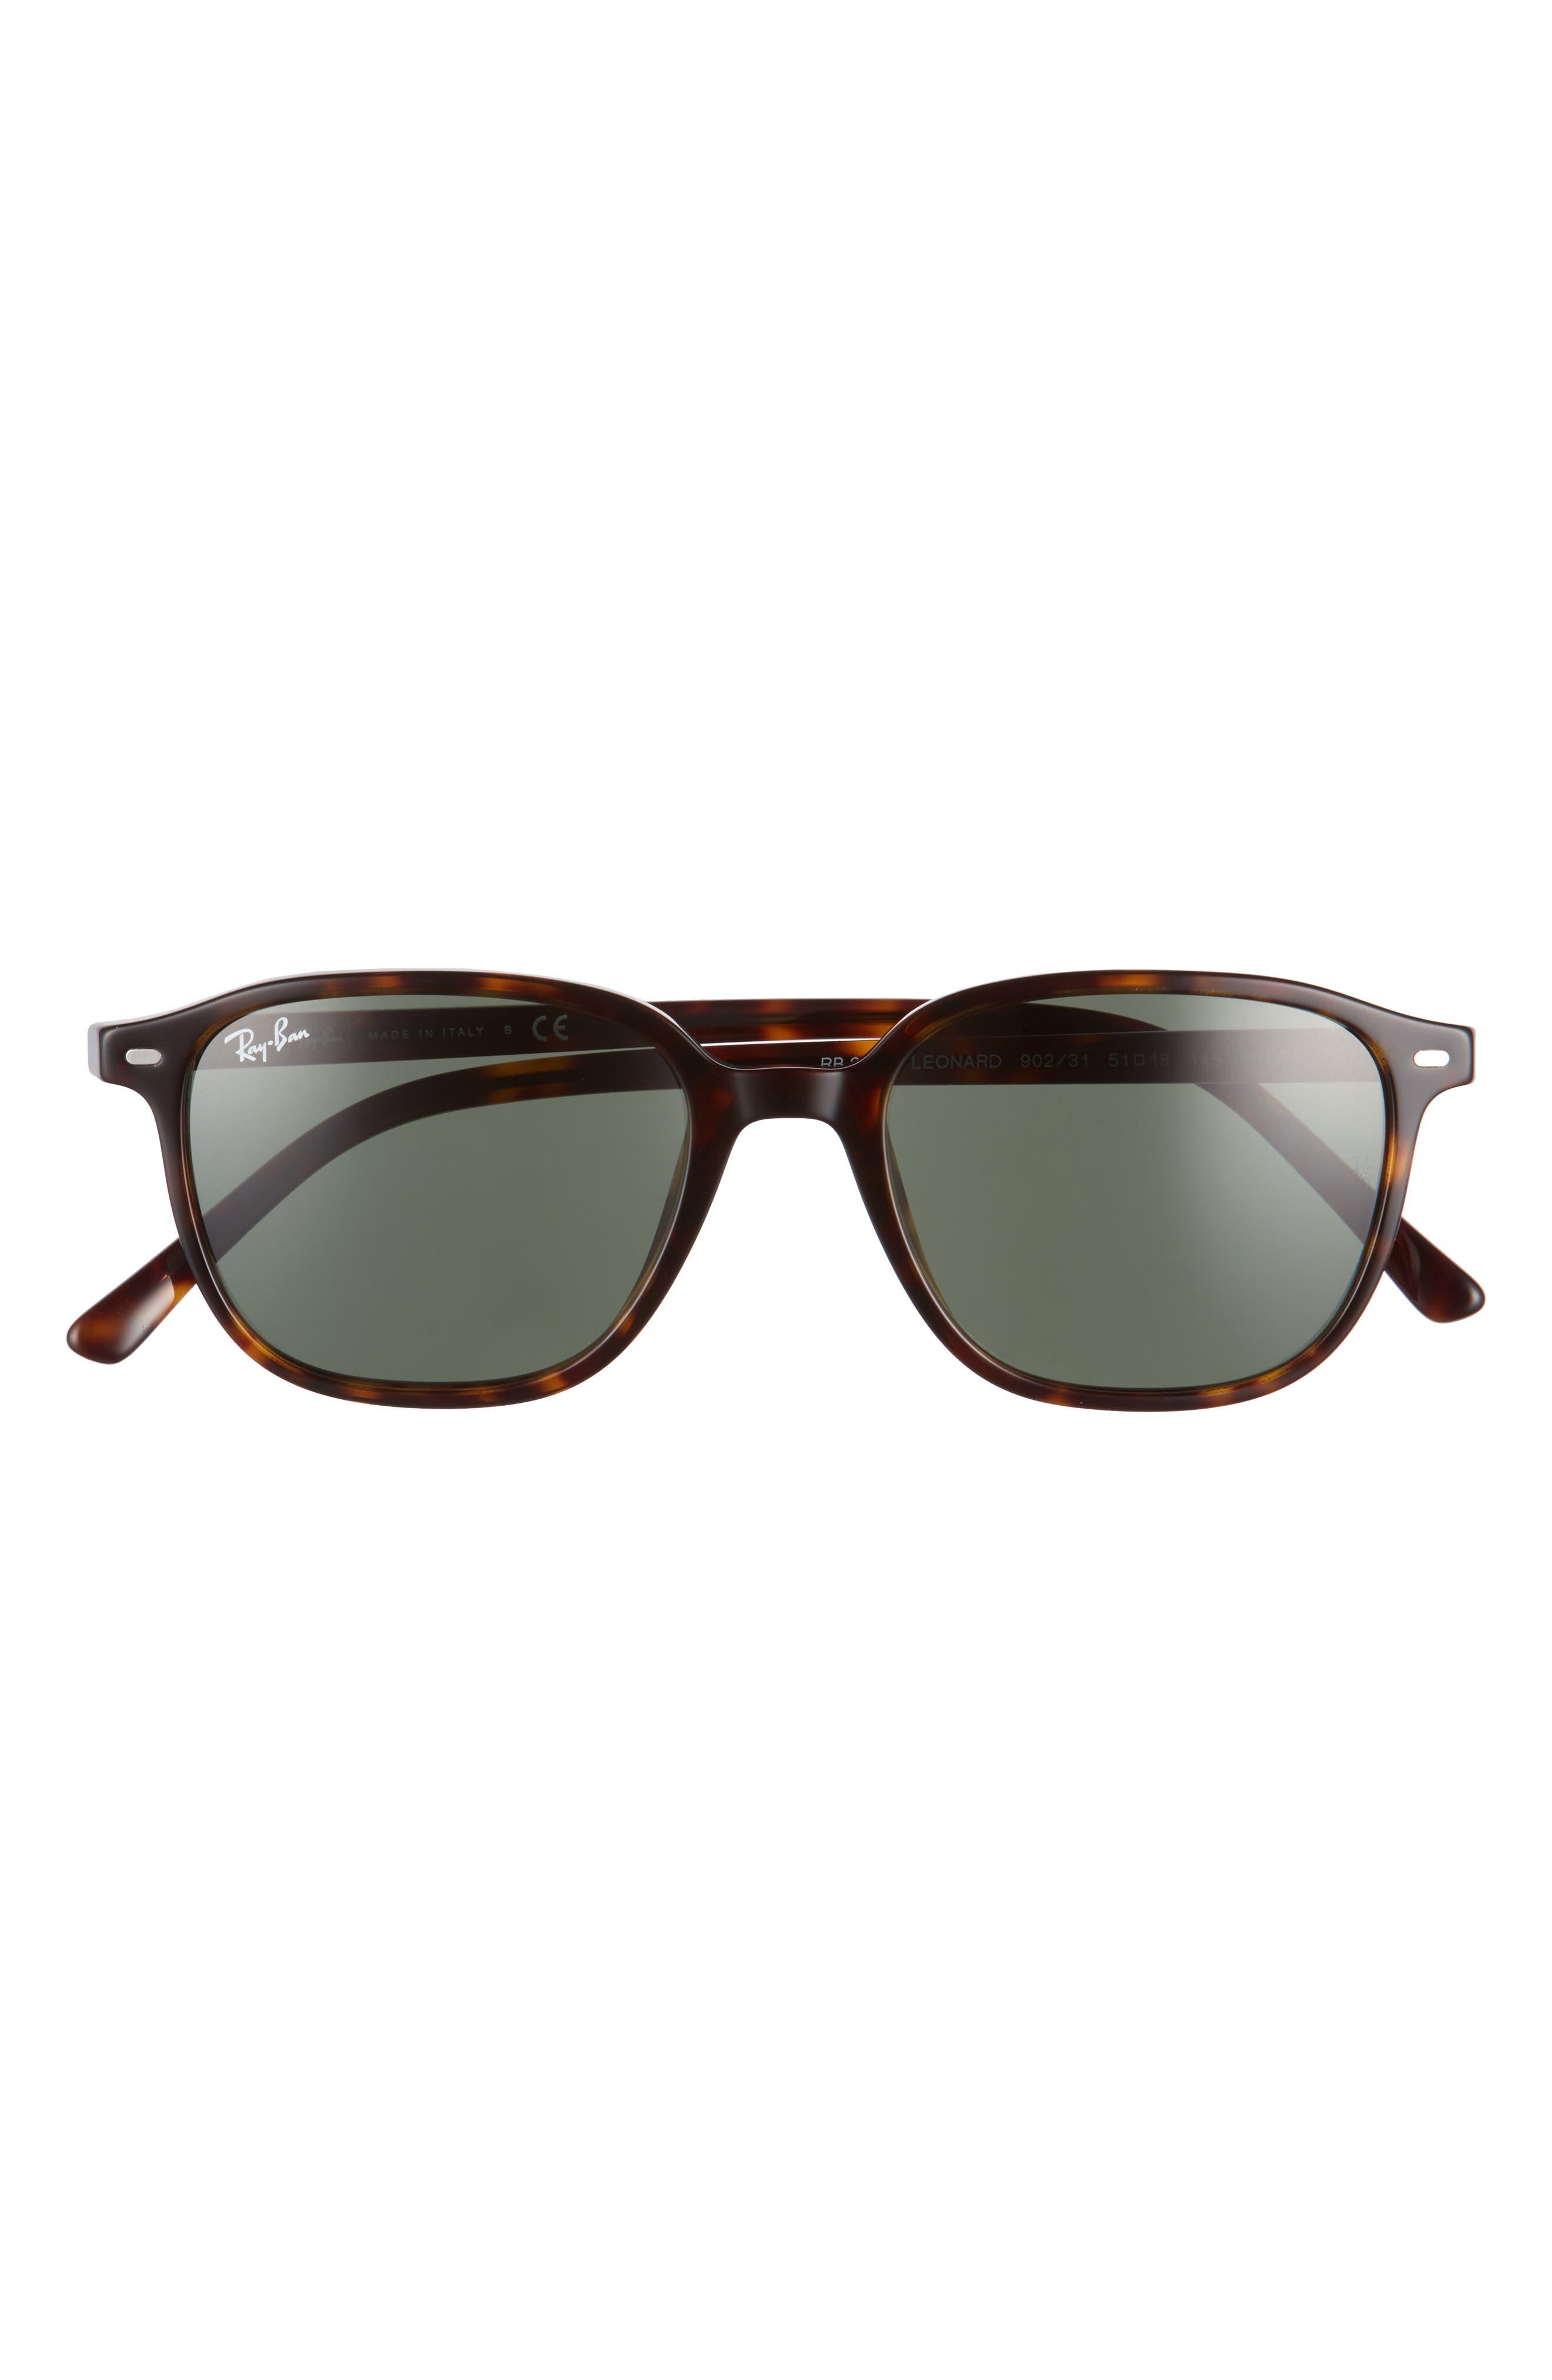 Image of Ray-Ban Wayfarer 51mm Sunglasses